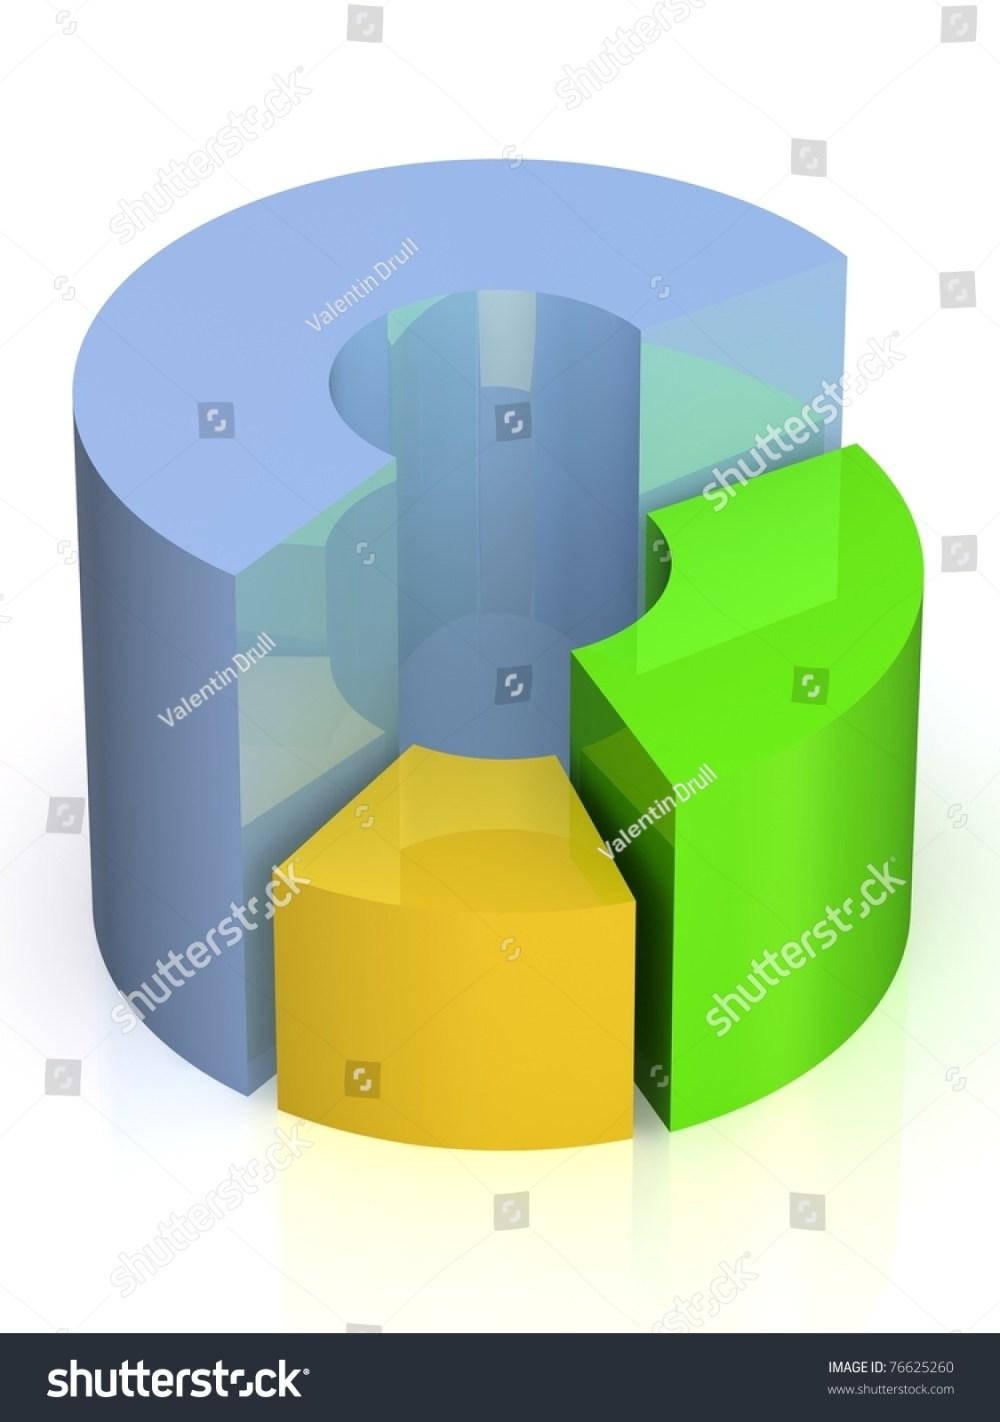 medium resolution of 3d circular diagram on white background